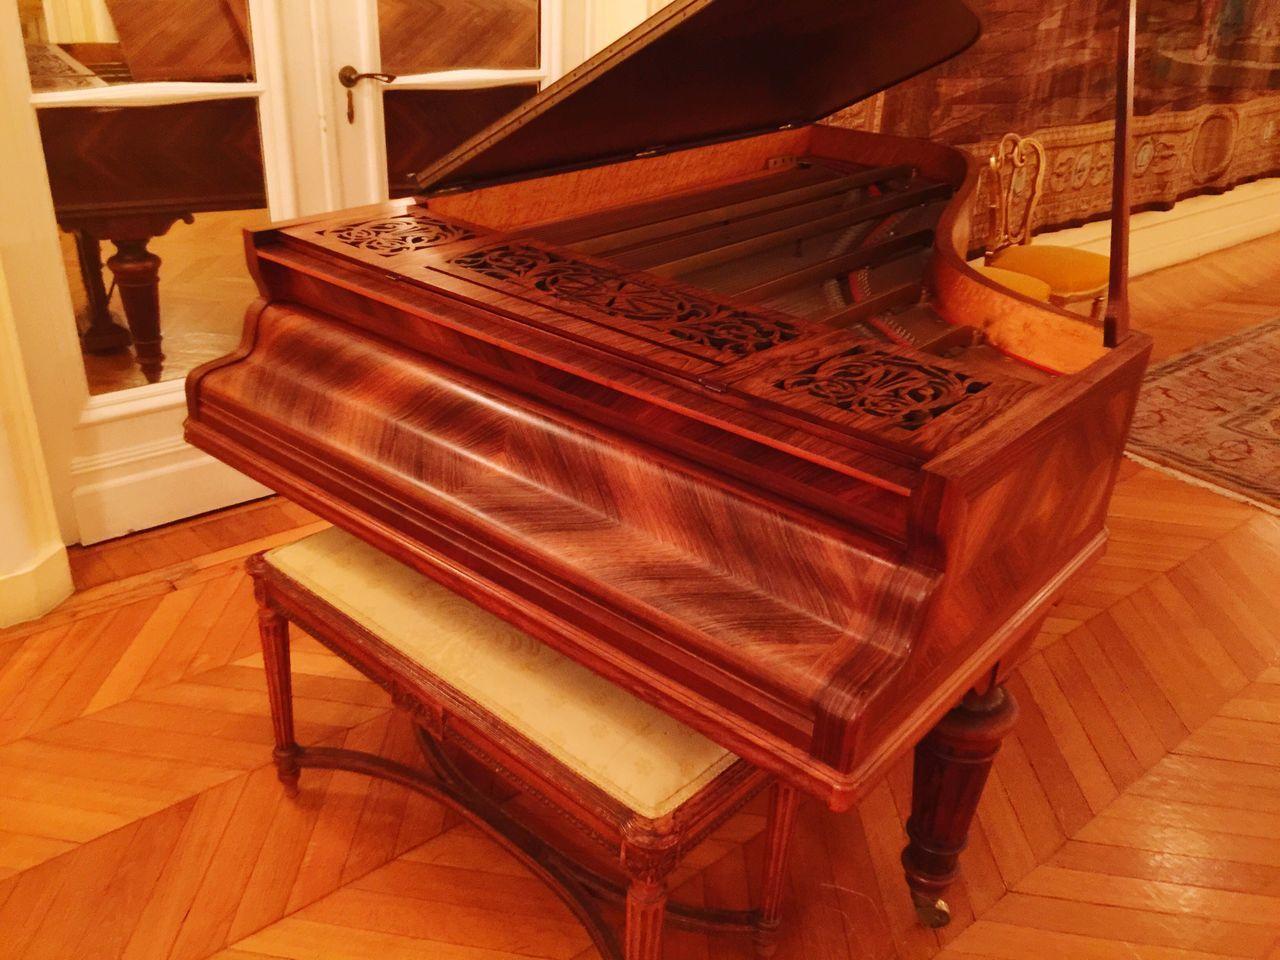 Seat By Piano On Hardwood Floor